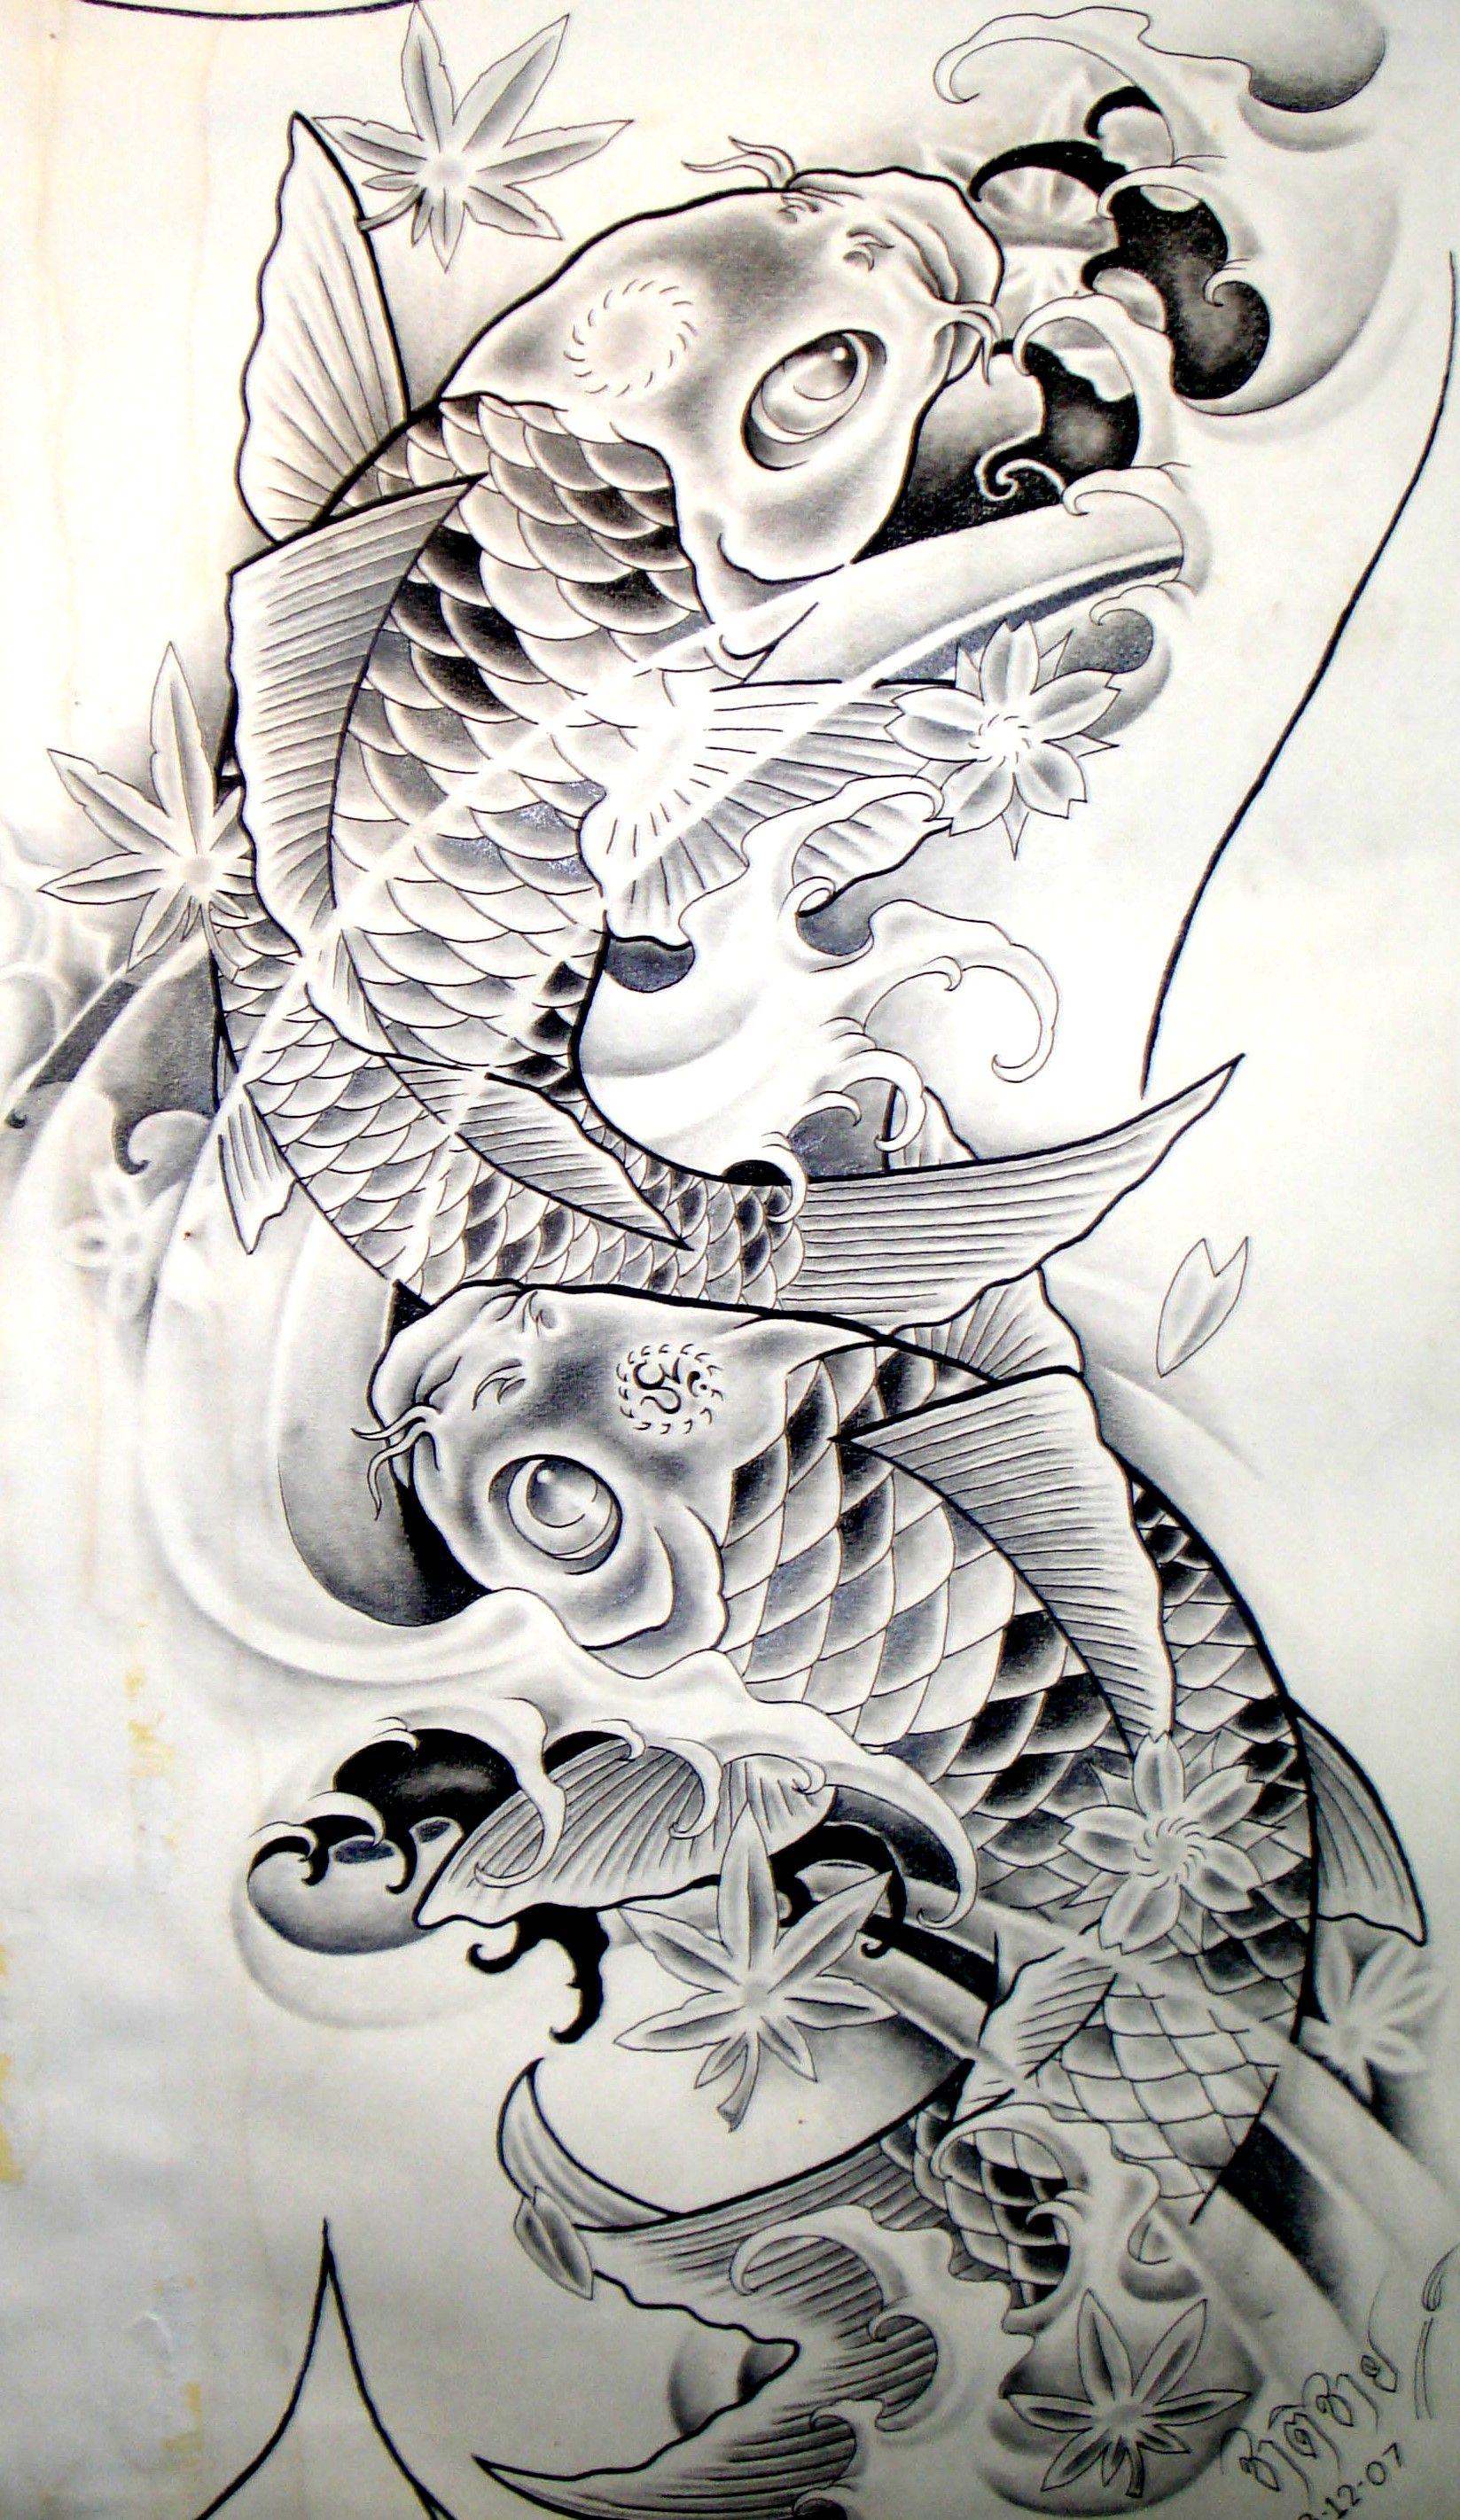 koi_carp_sketch | Tatuajes, Koi y Pez koi